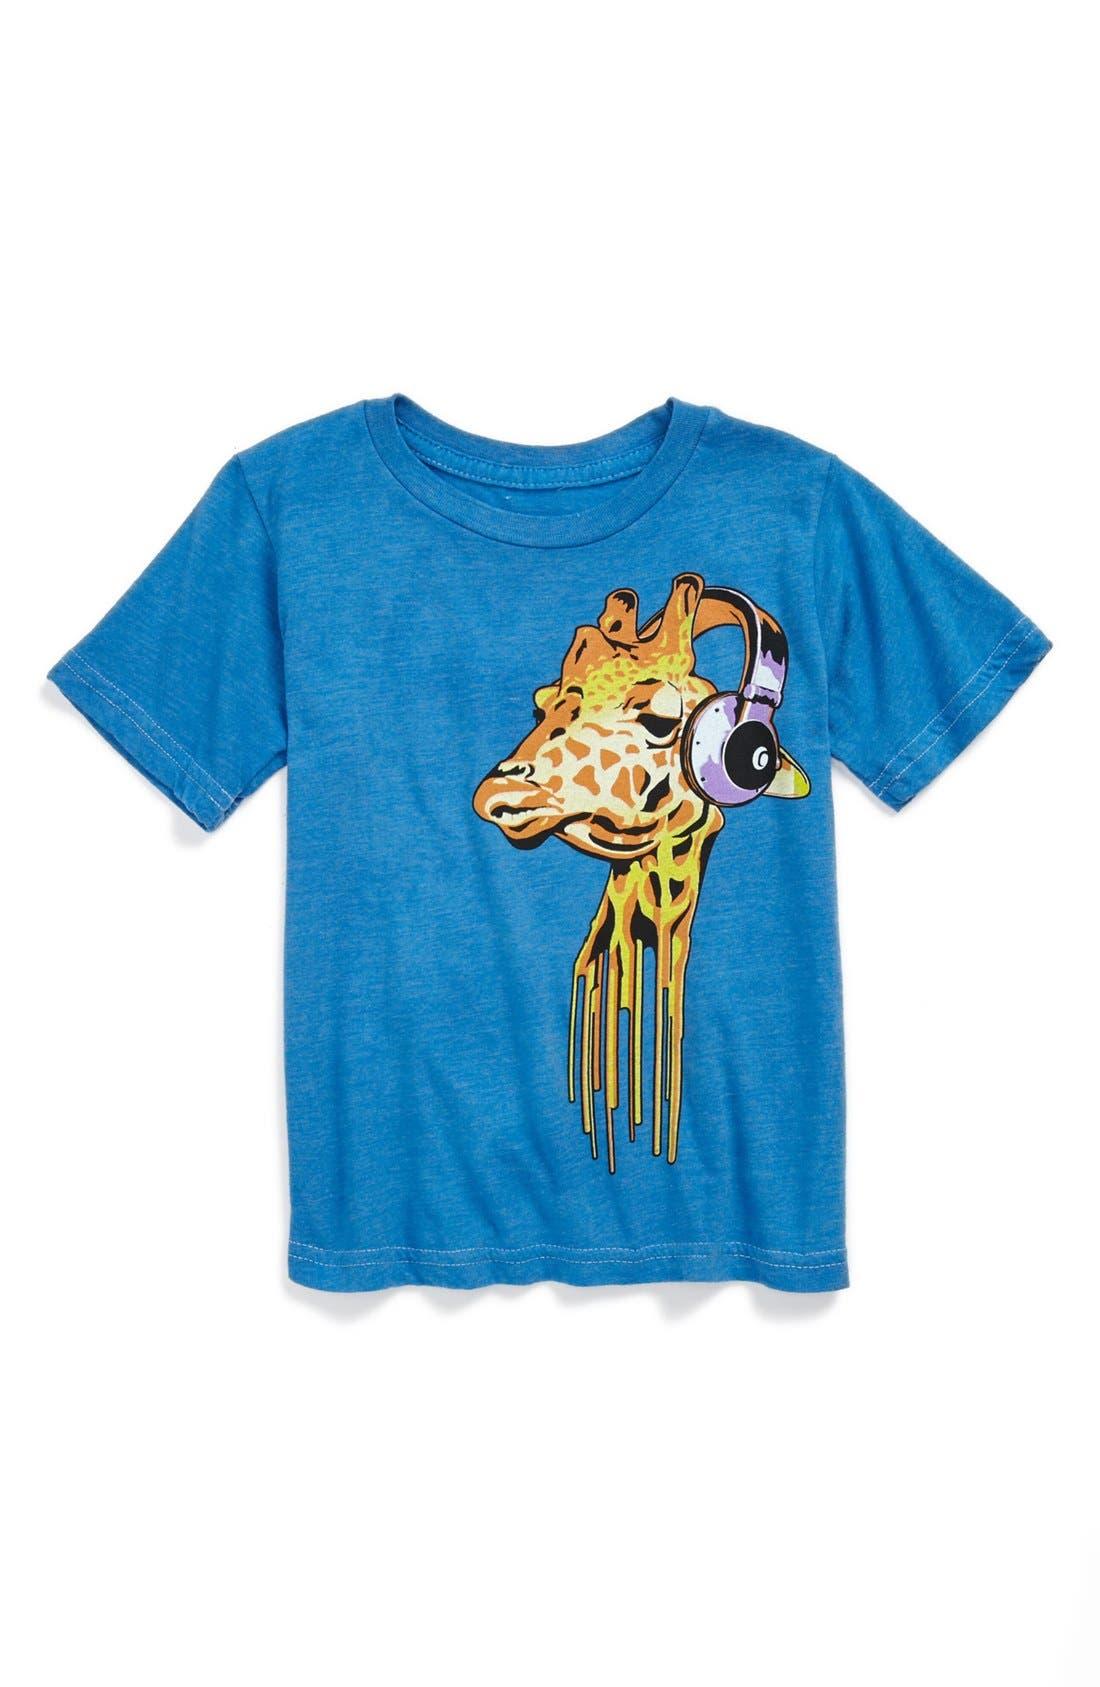 Alternate Image 1 Selected - Jem 'Heads Up Sky Diver' T-Shirt (Toddler Boys)